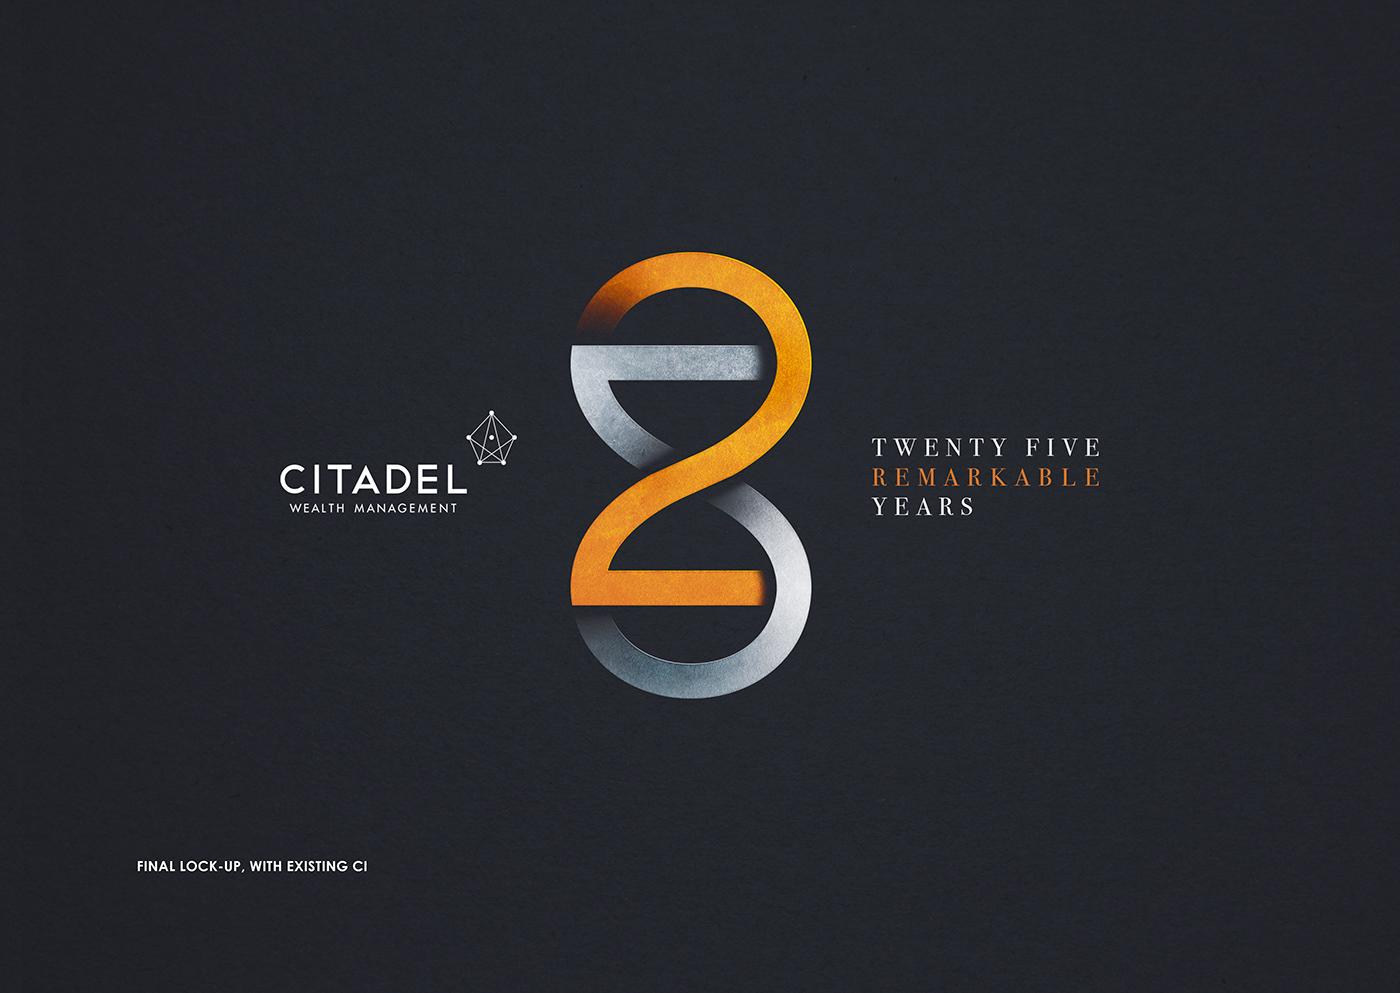 branding  art direction  Logo Design Citadel 25 years remarkable infinity clock hour glass